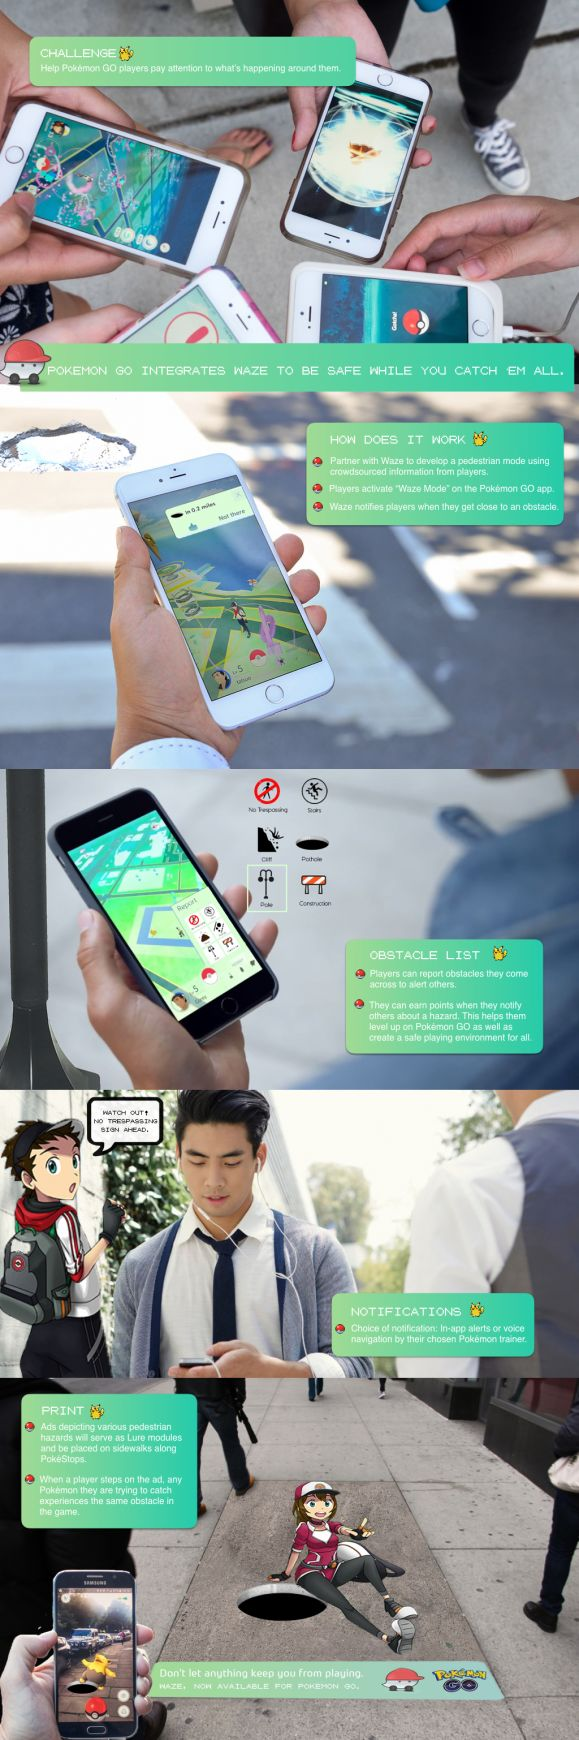 Pokemon GO: Pokemon GO integrates Waze to be safe while you Catch 'em all